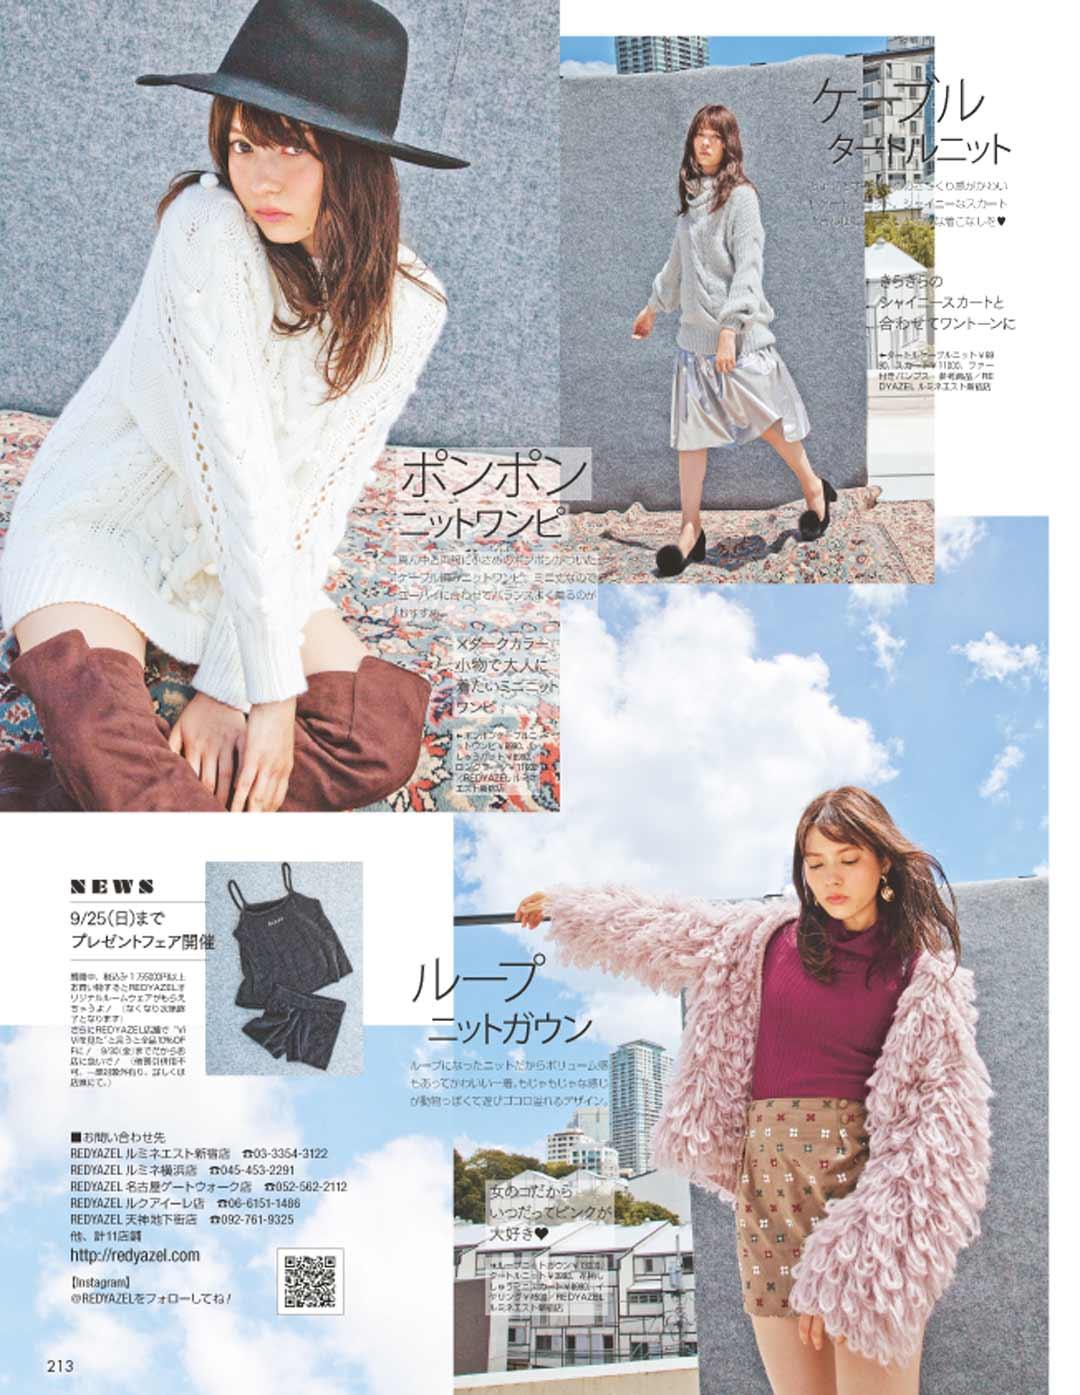 ViVi 11月号P.213『REDYAZEL[レディアゼル]【秋のマストバイニット&コート】』掲載